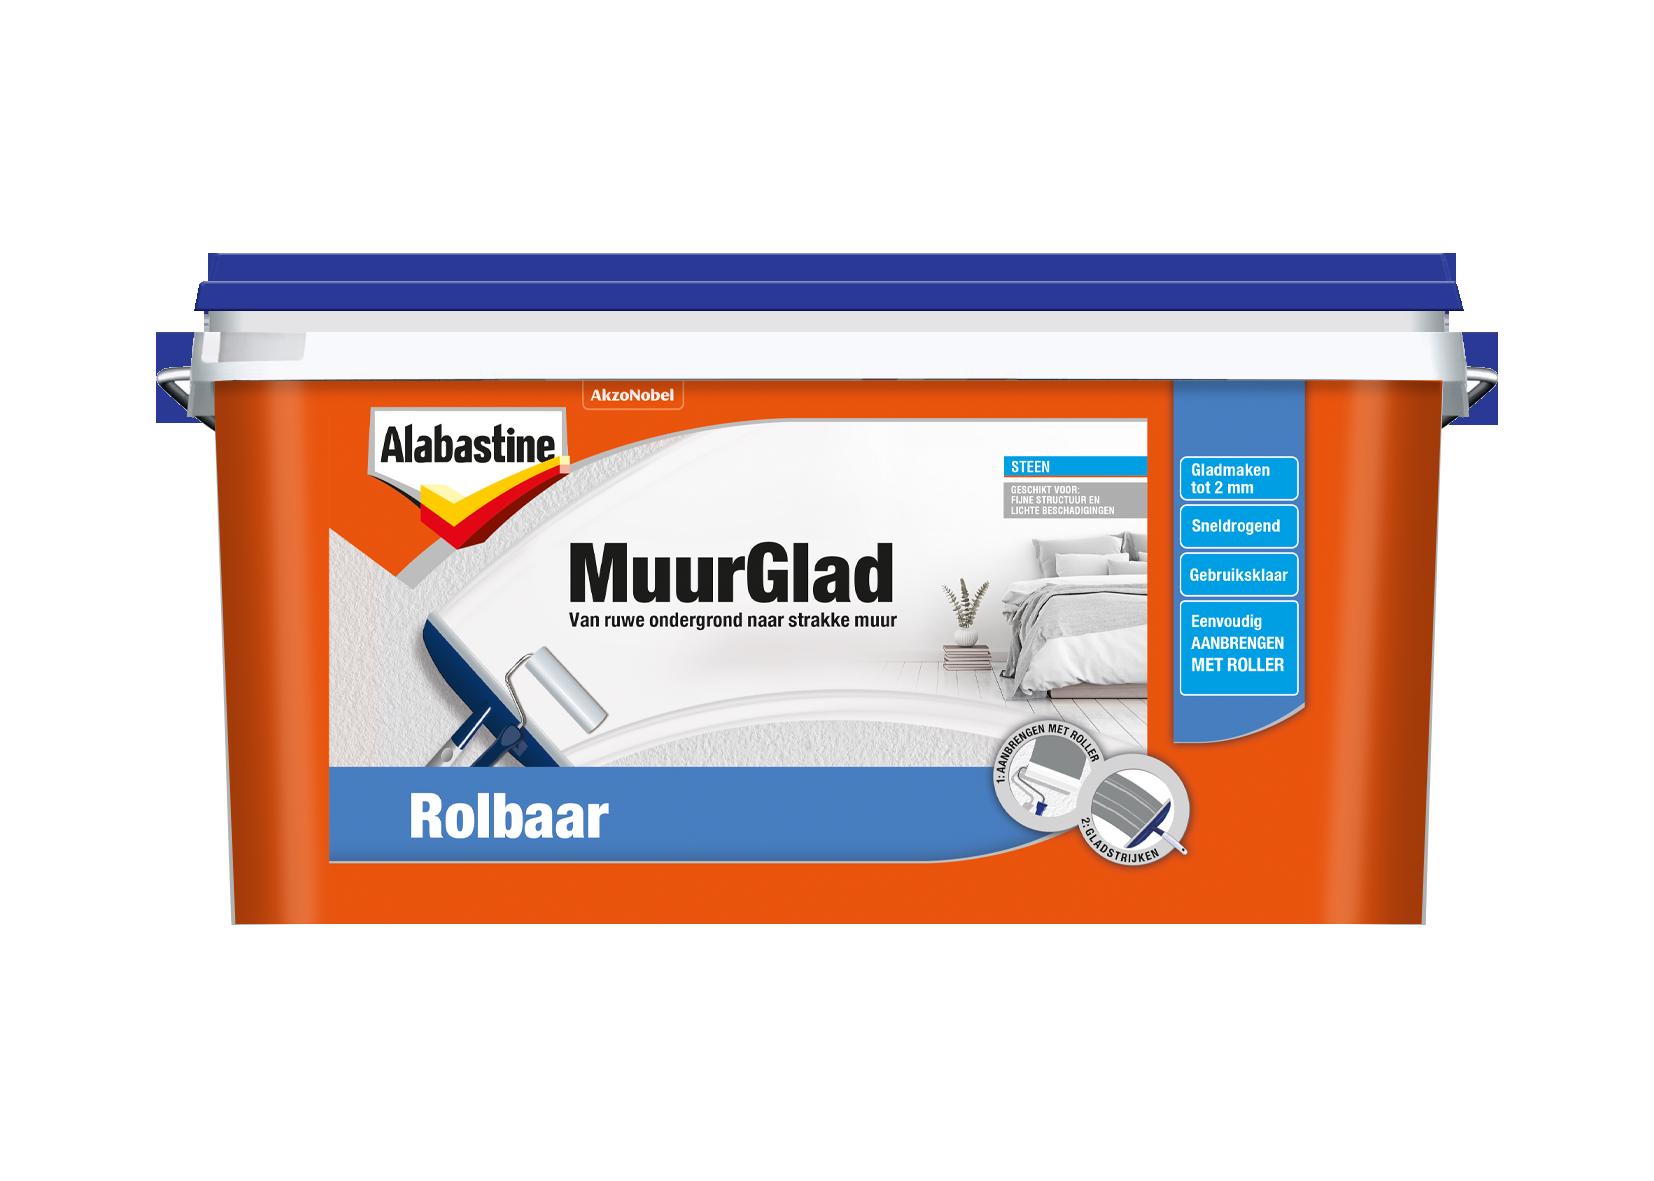 AB_Muurglad-Rolbaar_5L-Packshot